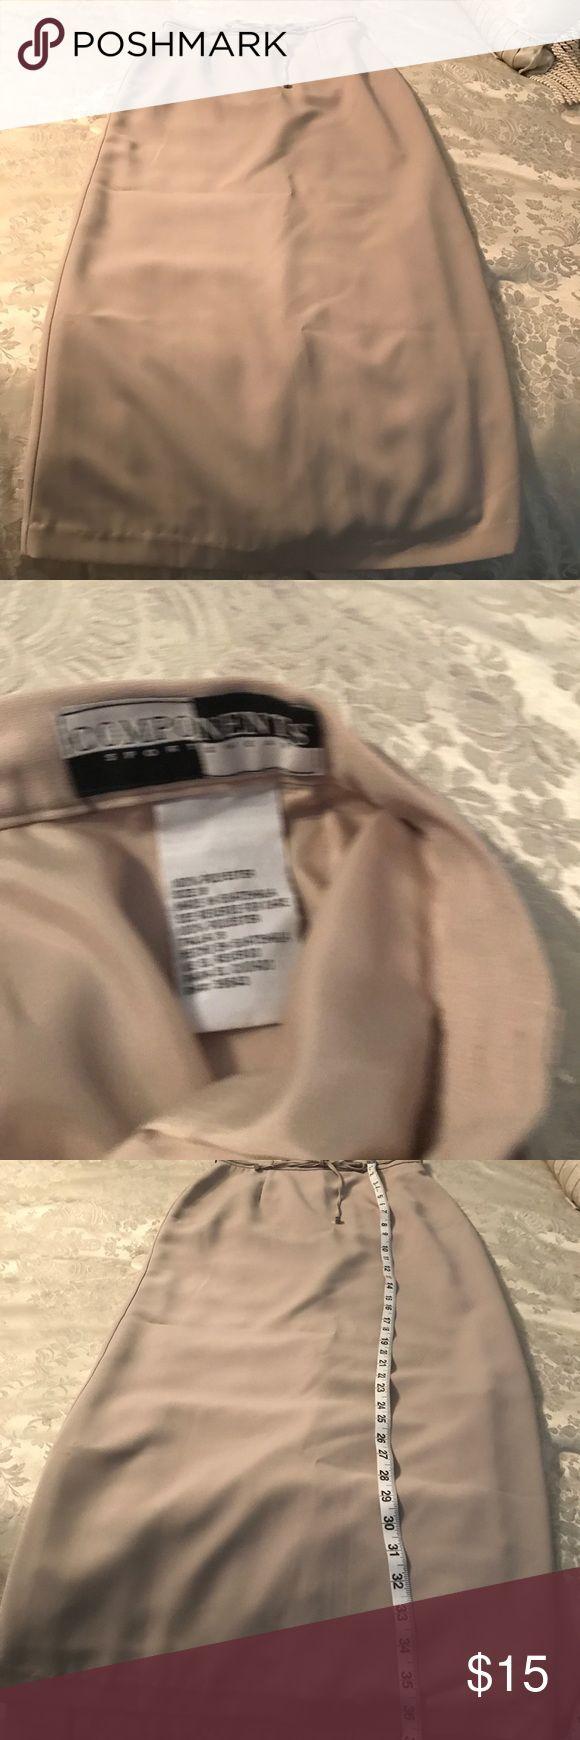 Components Sportswear skirt size 8 Cream maxi skirt size 8 Components Sportswear Skirts Maxi